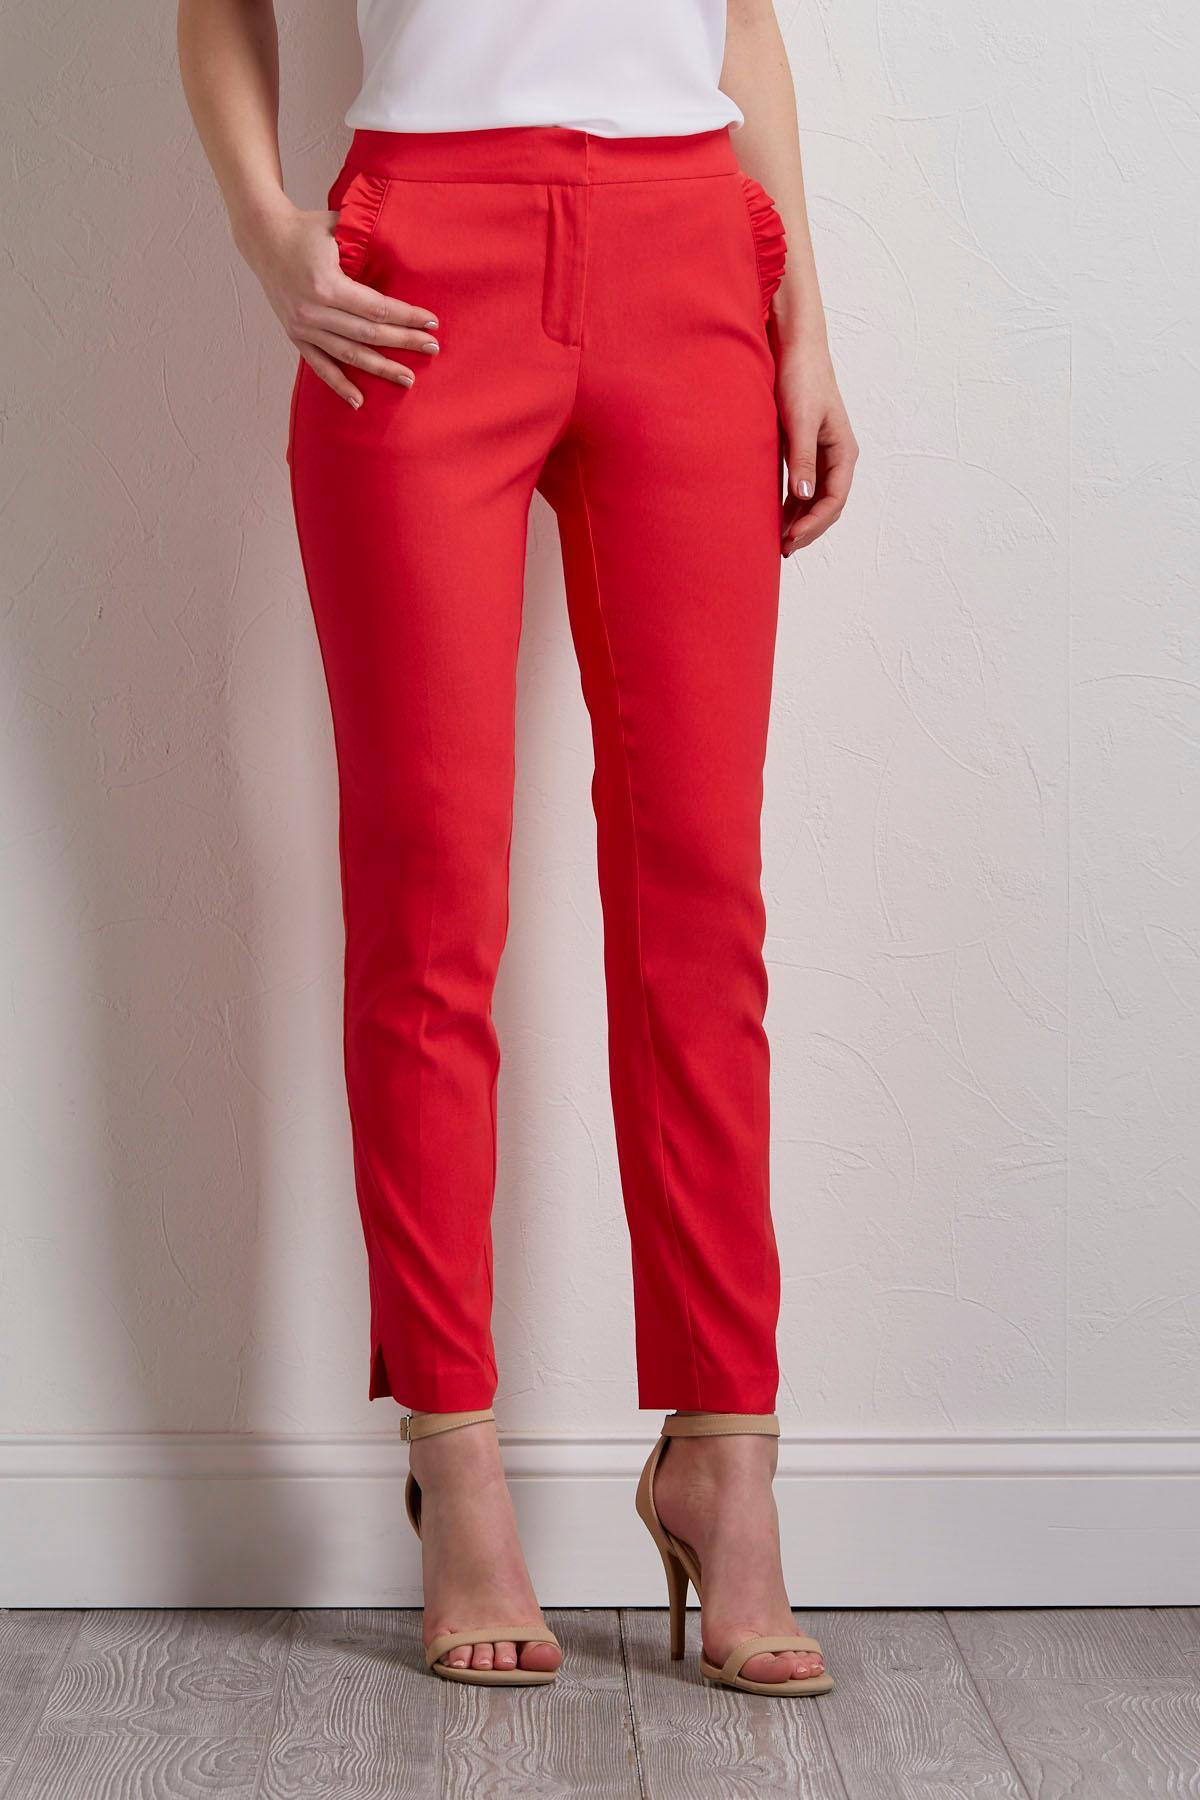 Ruffled Pocket Slim Ankle Pants